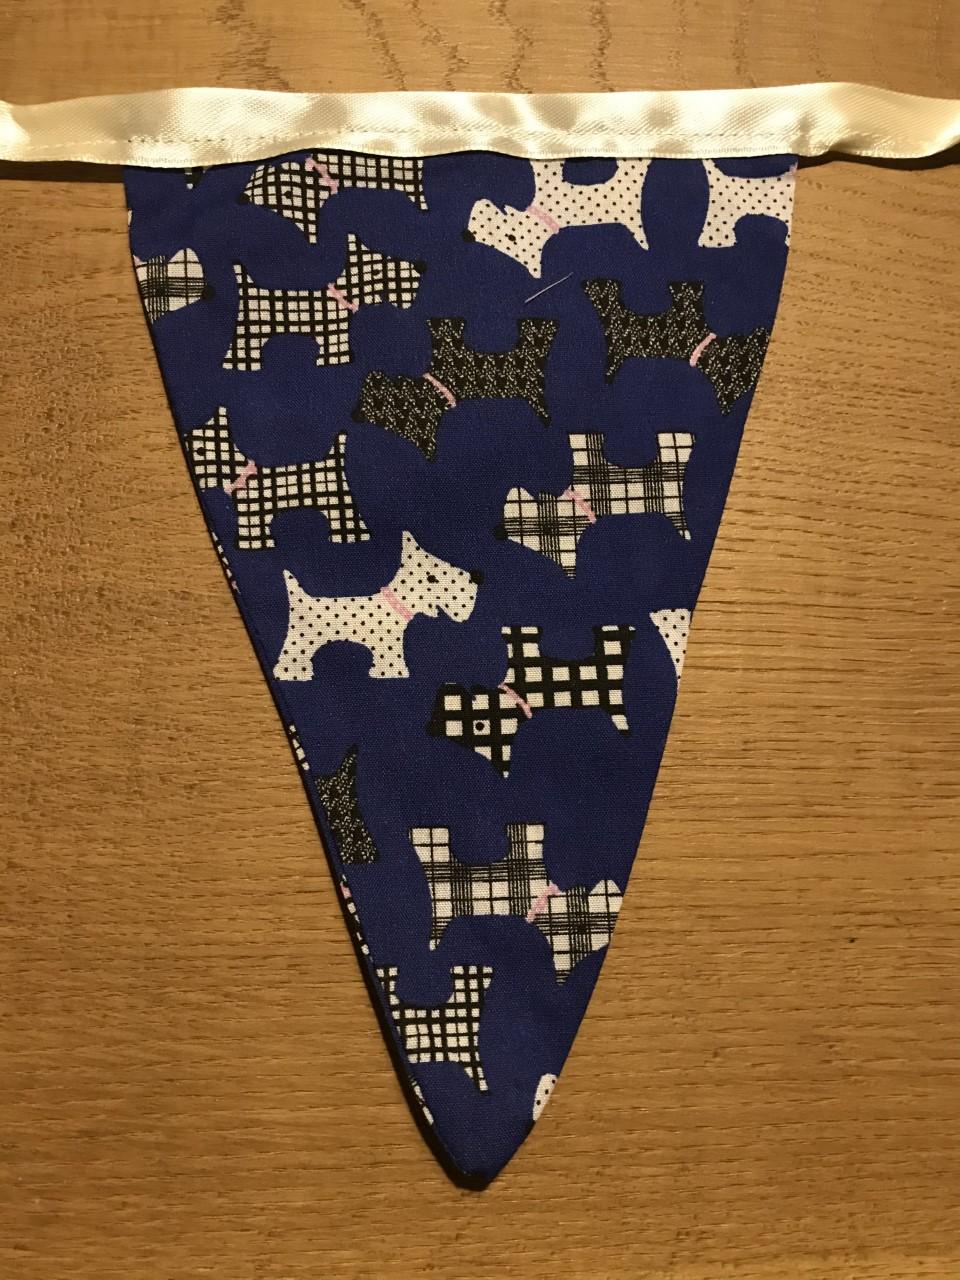 Bunting - Dark Blue Dog Print (3 metres) **Was £10.00 Now £5.00**